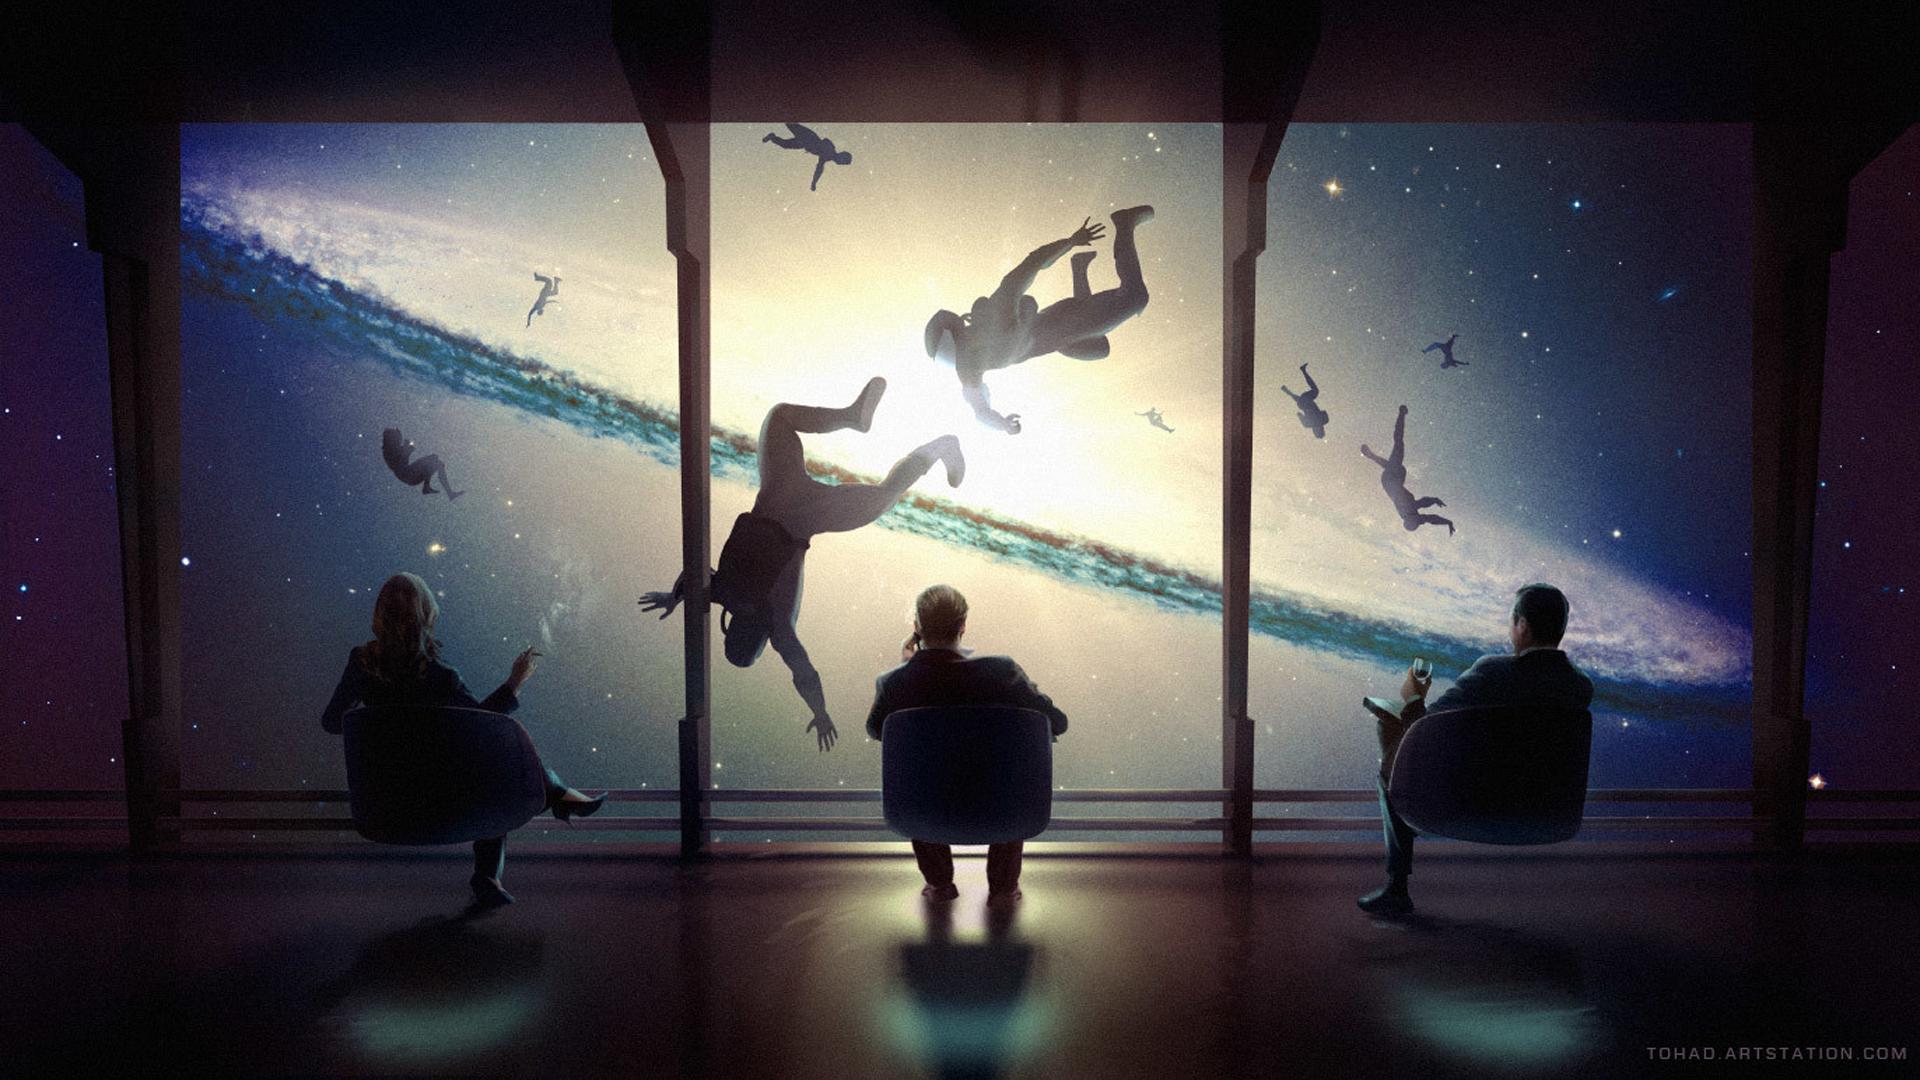 General 1920x1080 Sylvain Sarrailh artwork space death explosion sitting by the window stars digital art